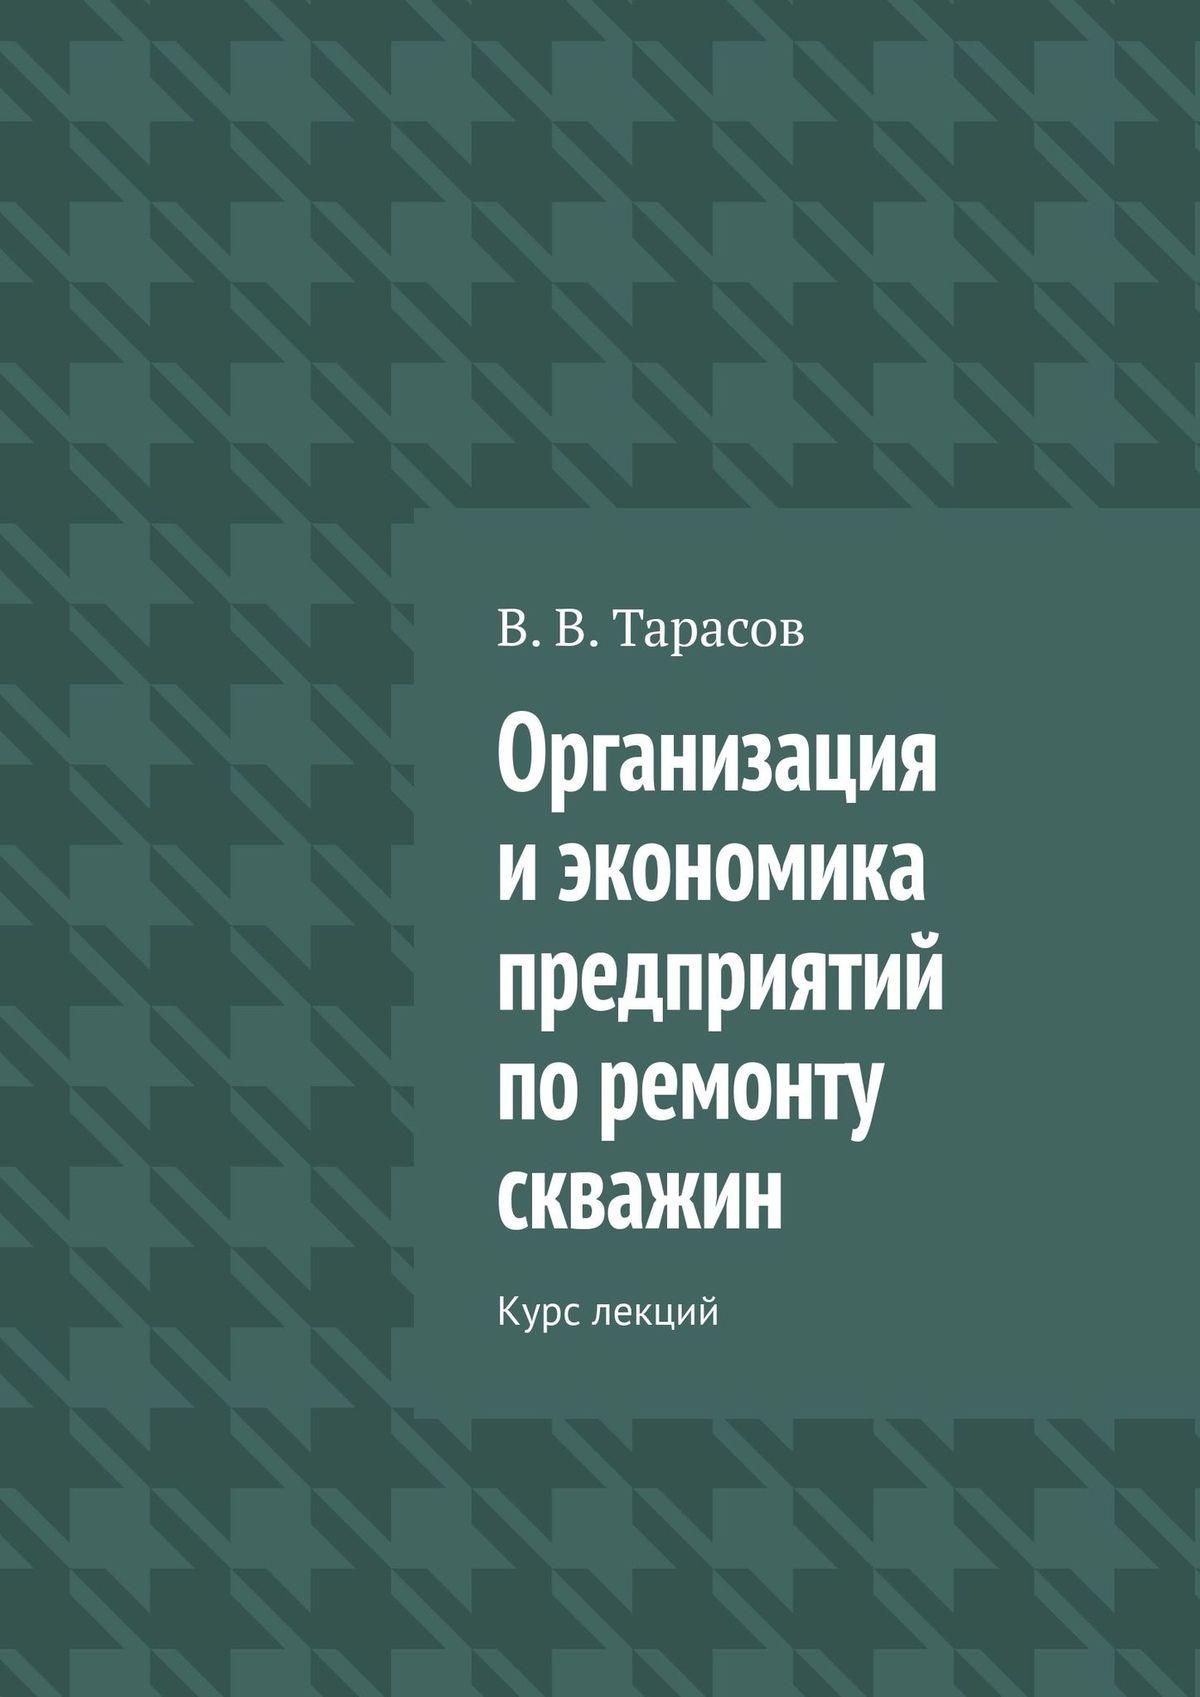 В. В. Тарасов Организация иэкономика предприятий поремонту скважин. Курс лекций цена